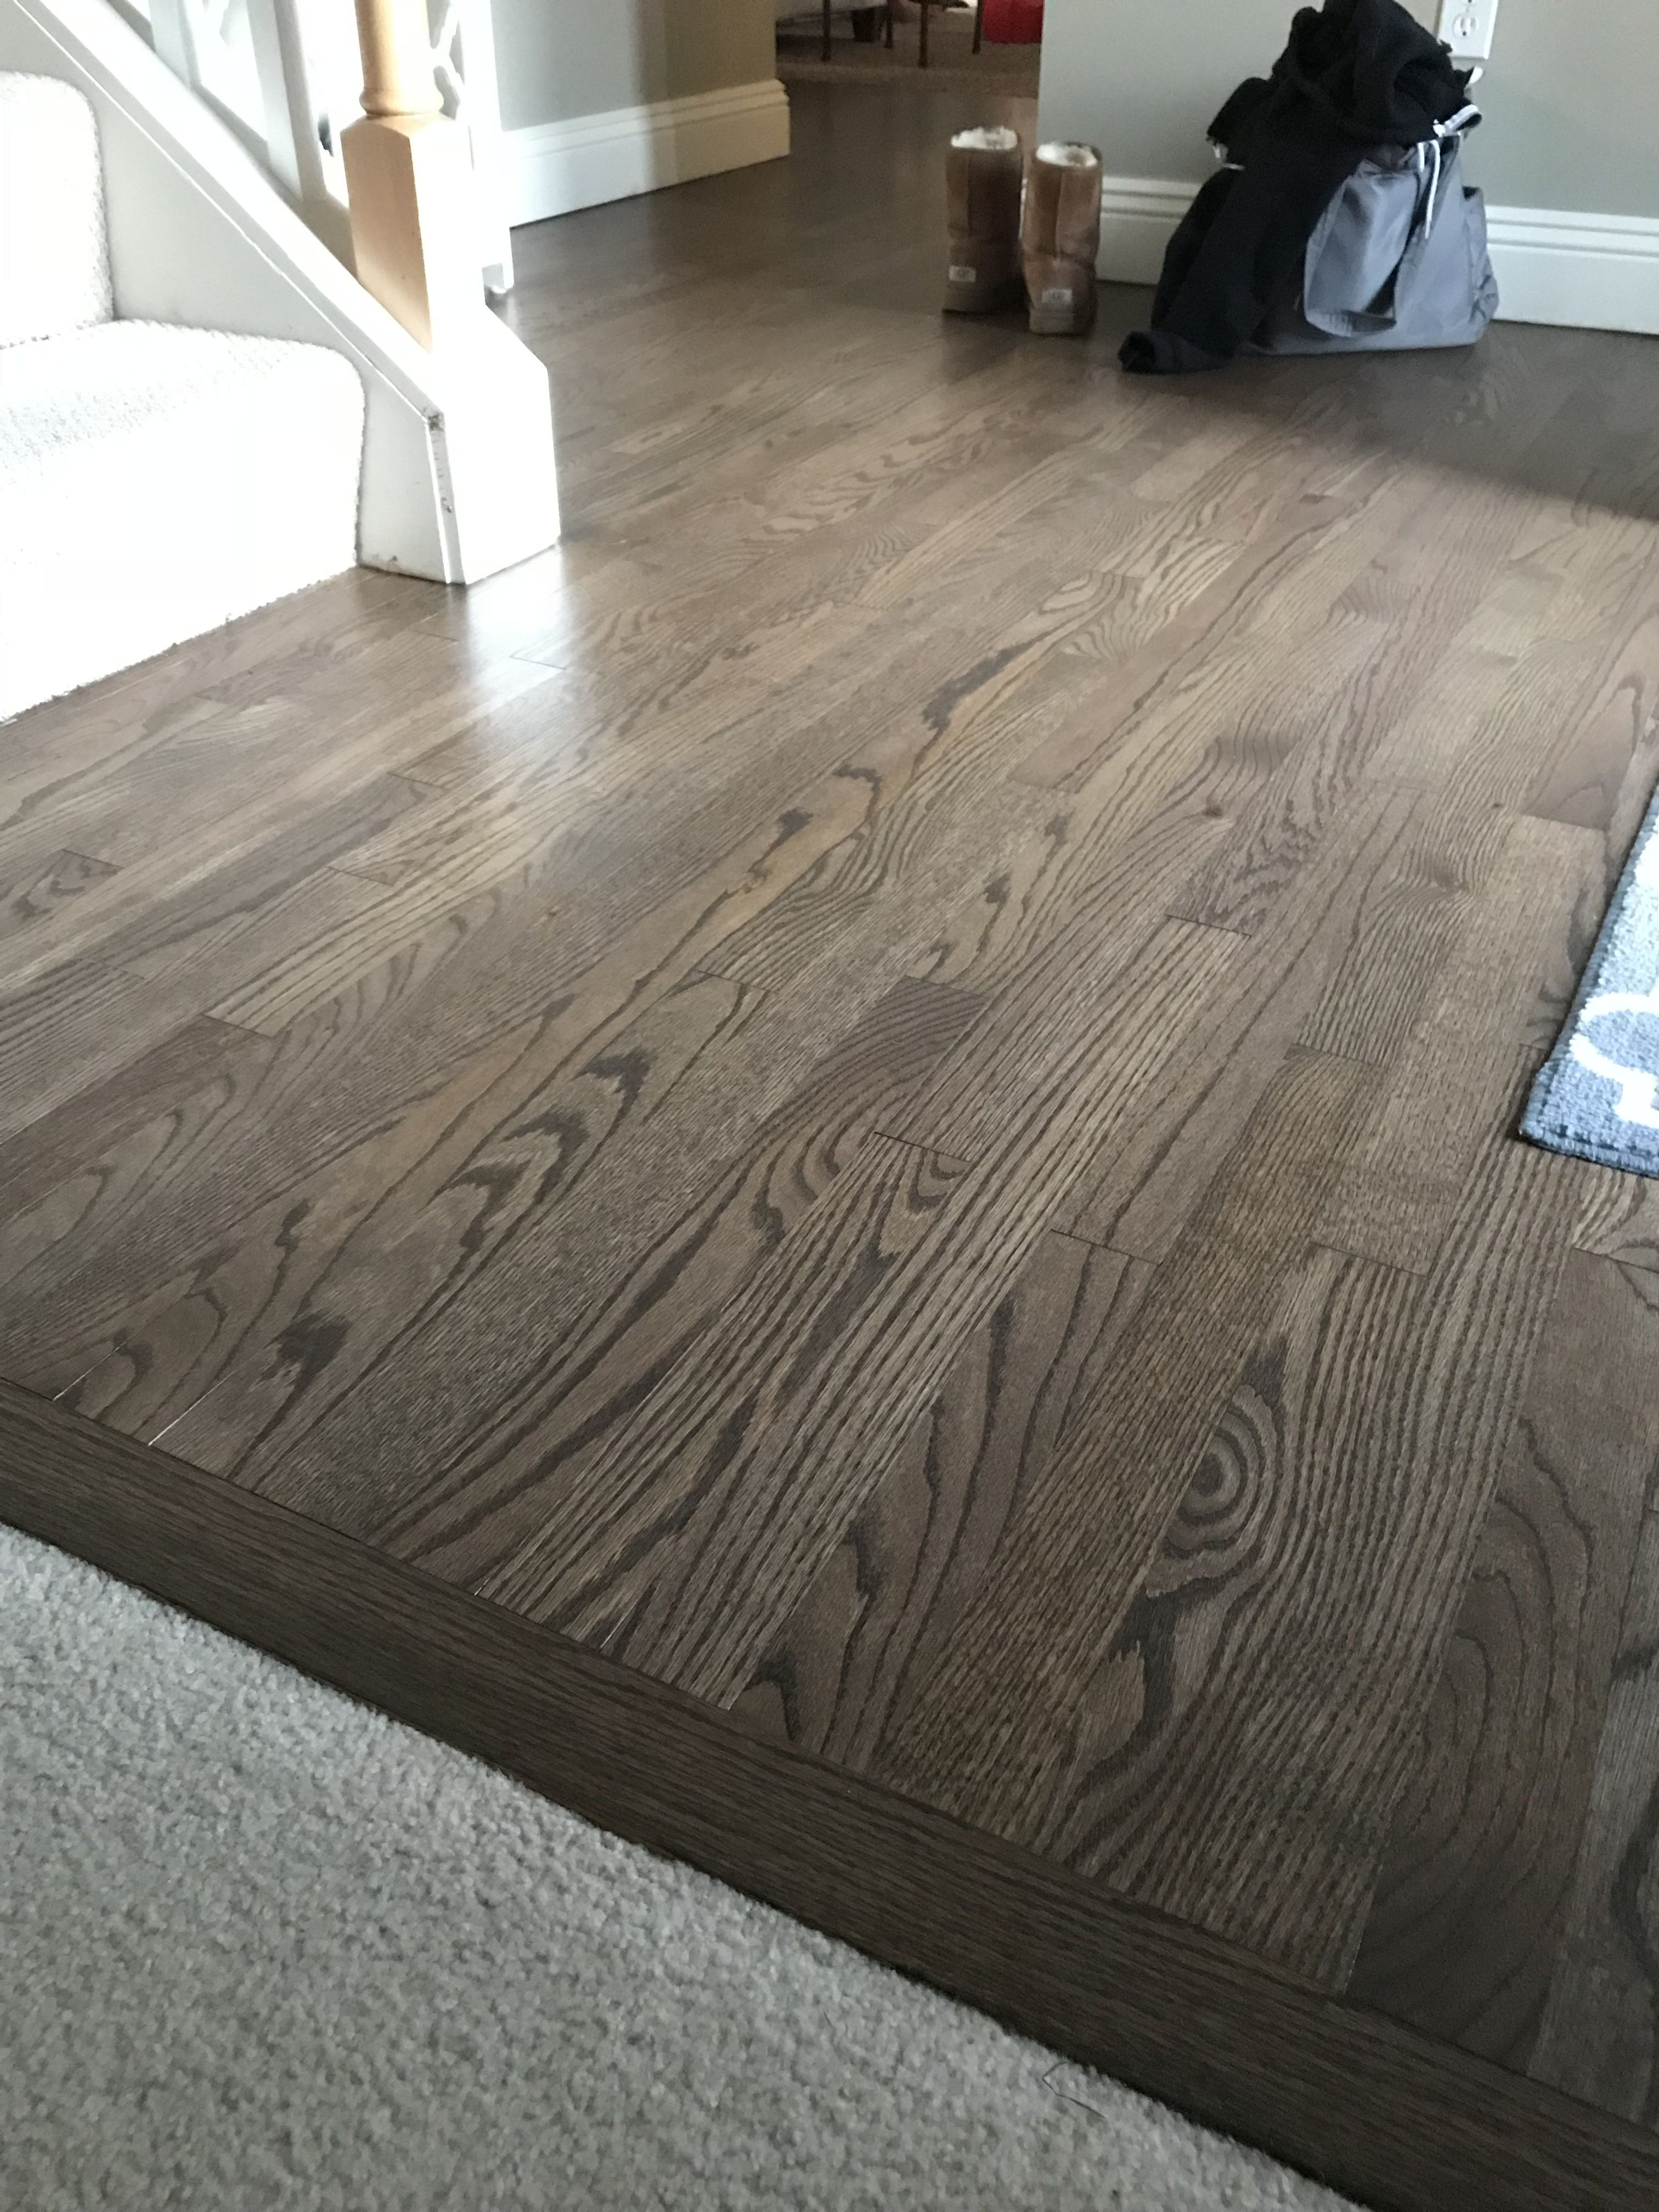 Hardwood Floors Refinished In Espresso And Grey Wood Floor